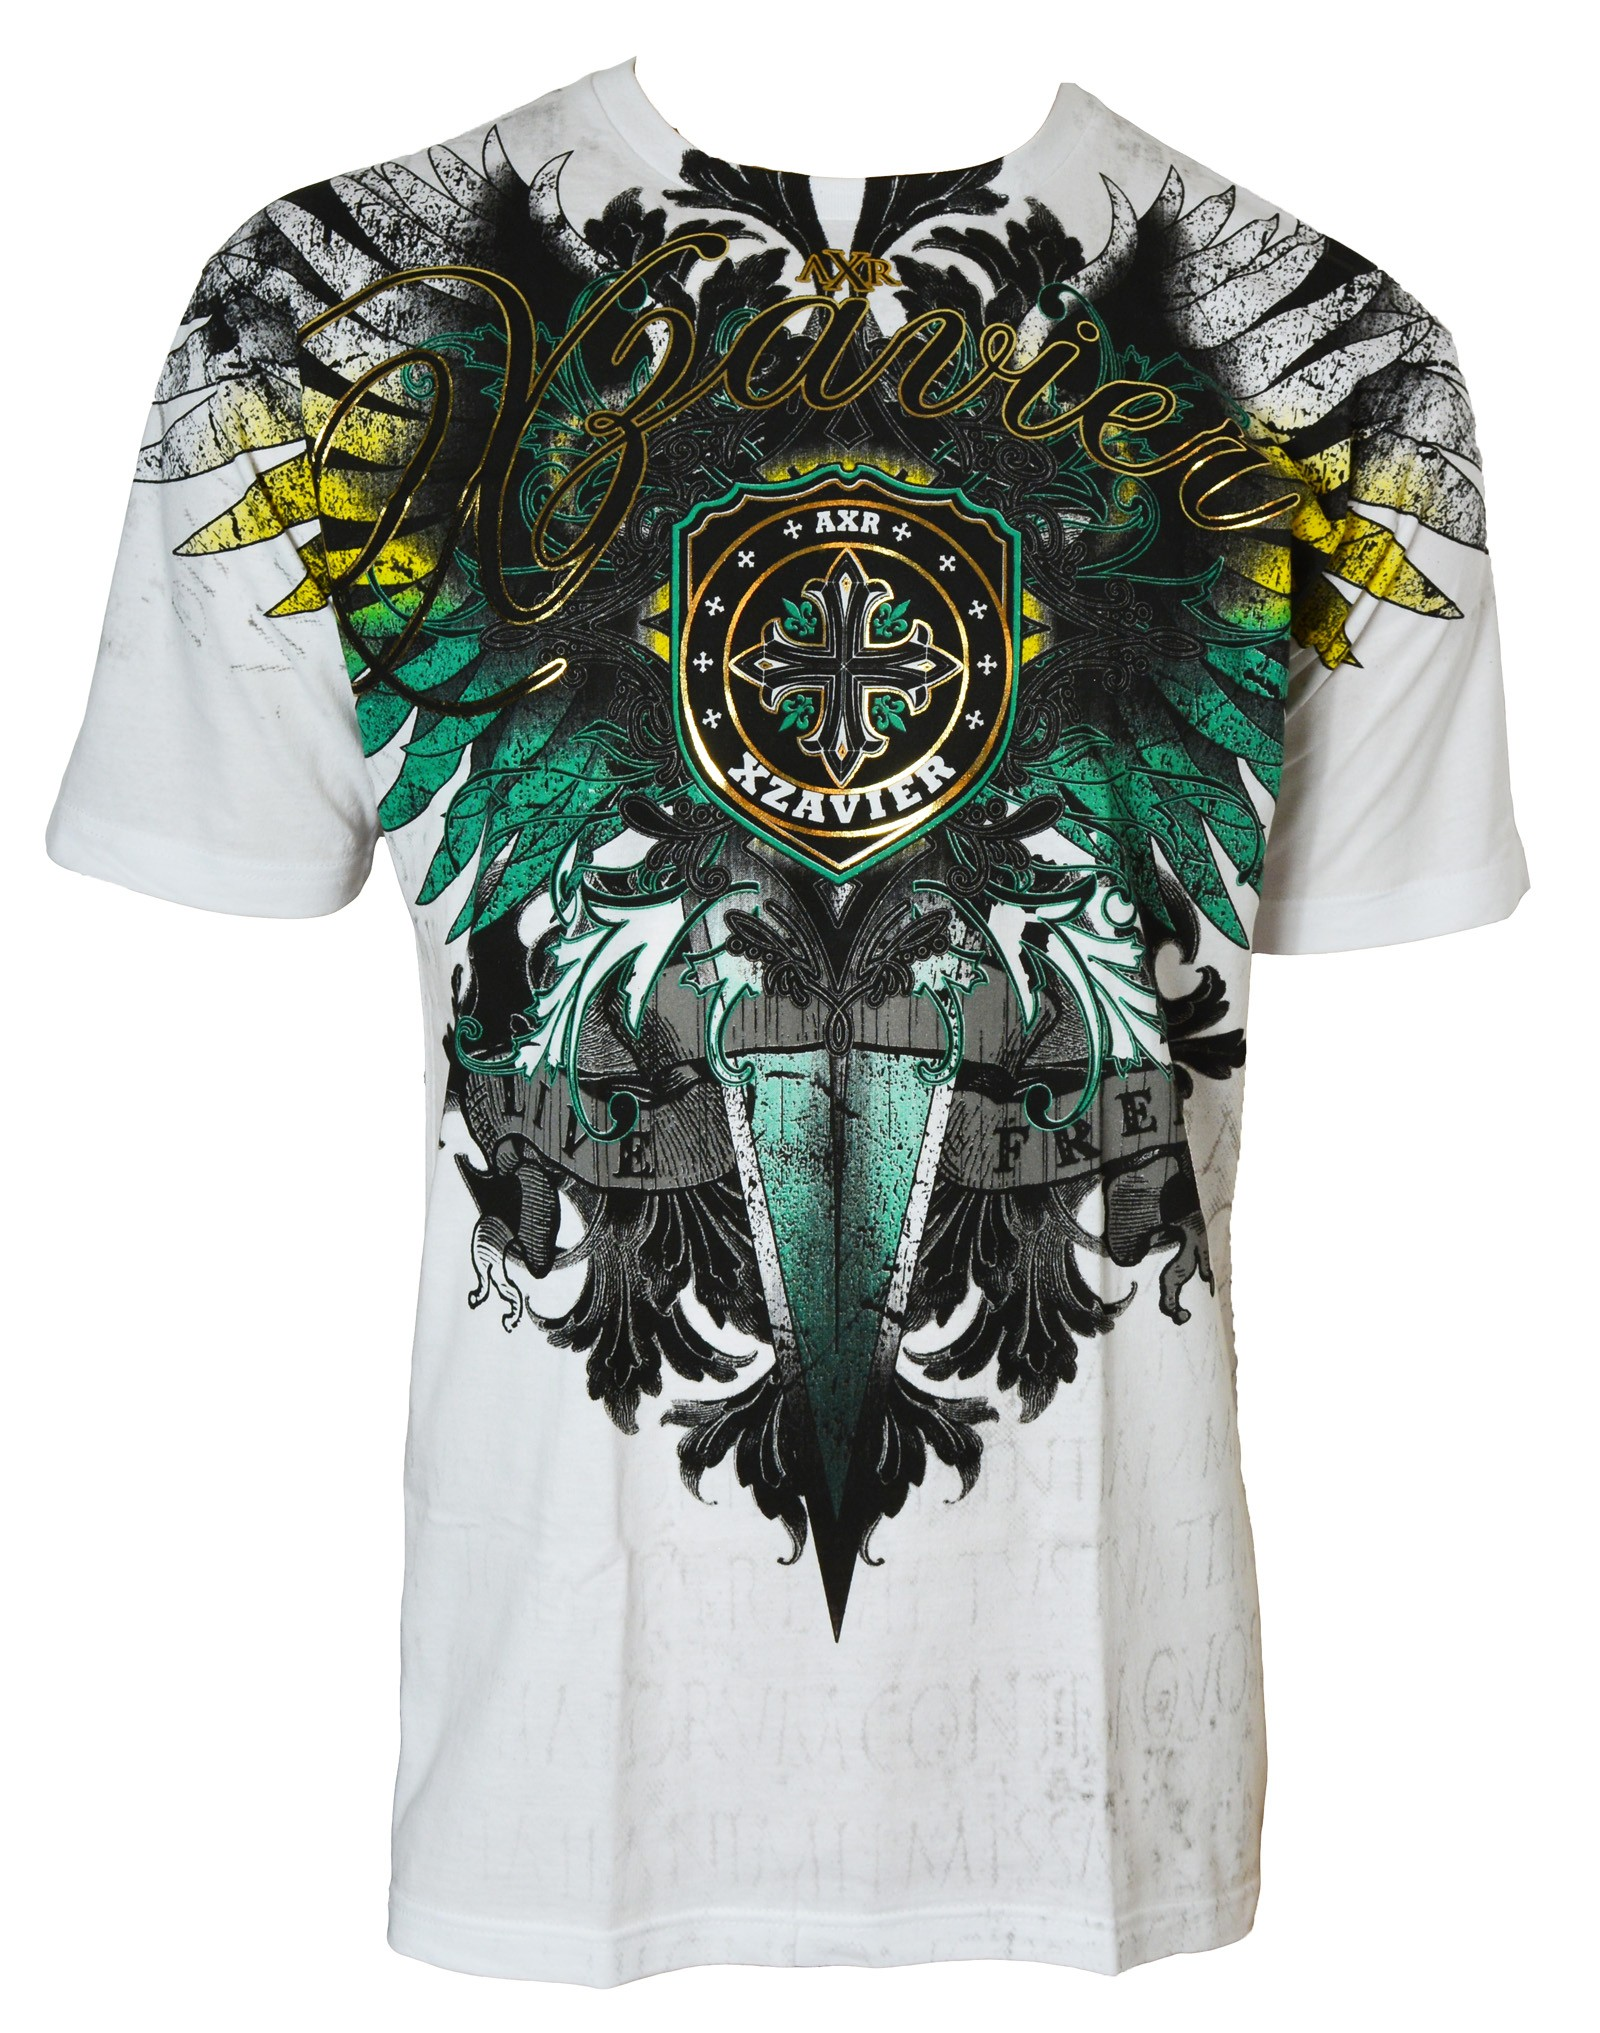 Xzavier - Noise & Daggers T-Shirt